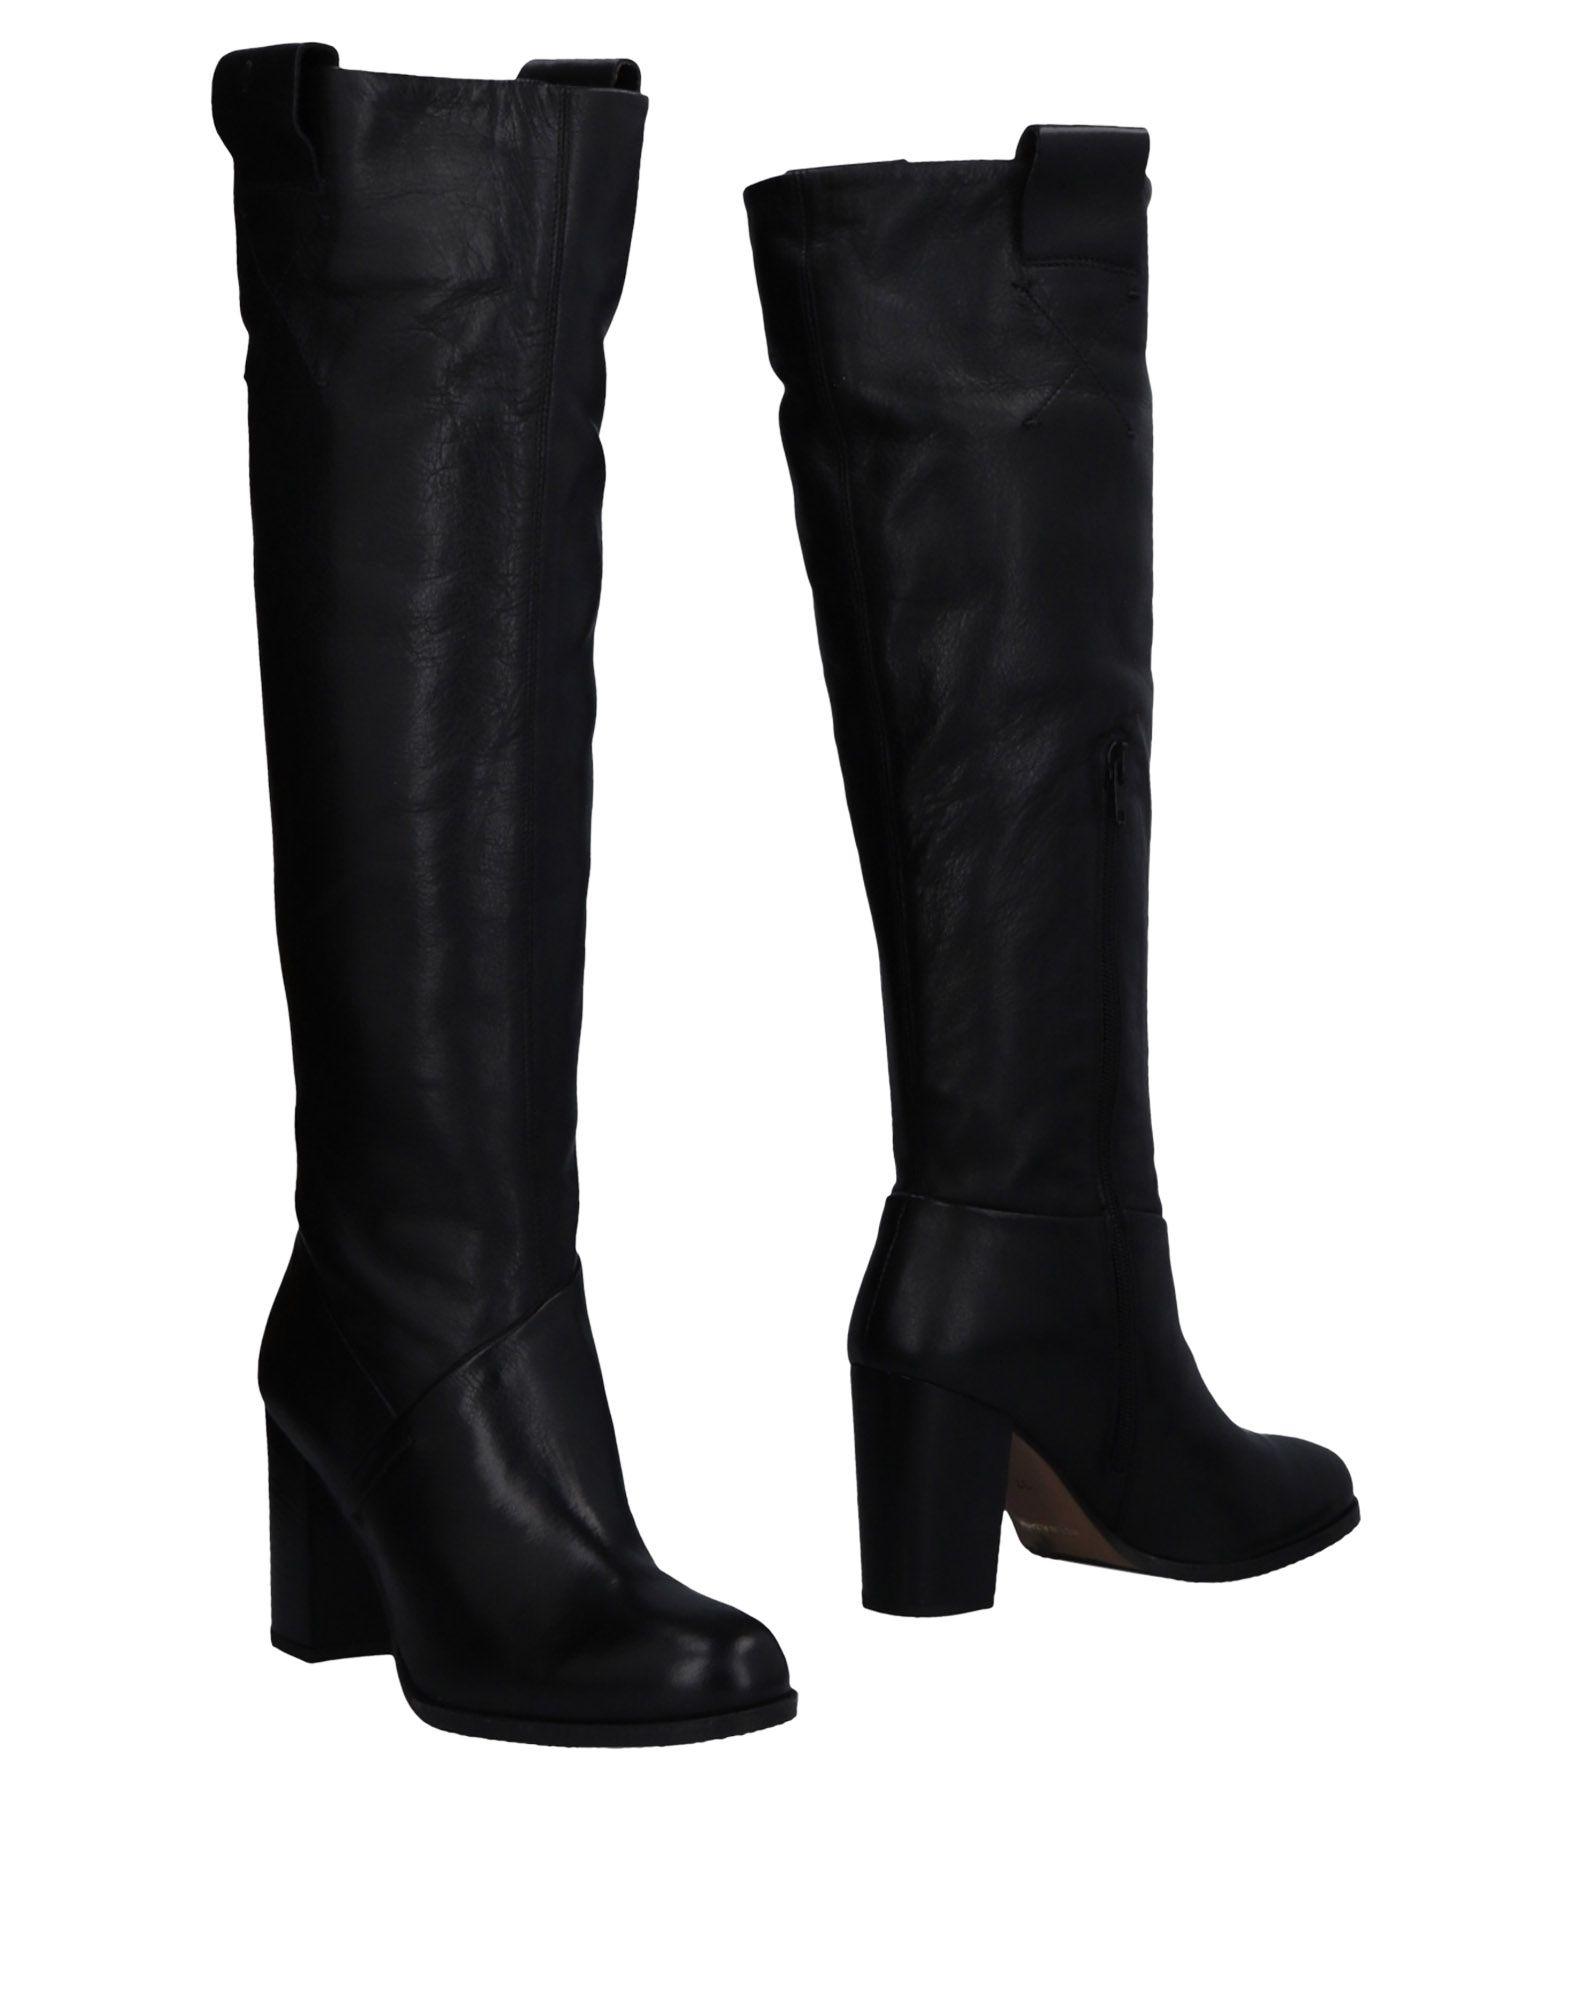 Paola Paola Ferri Boots - Women Paola Paola Ferri Boots online on  Australia - 11475801SR 4eaf46